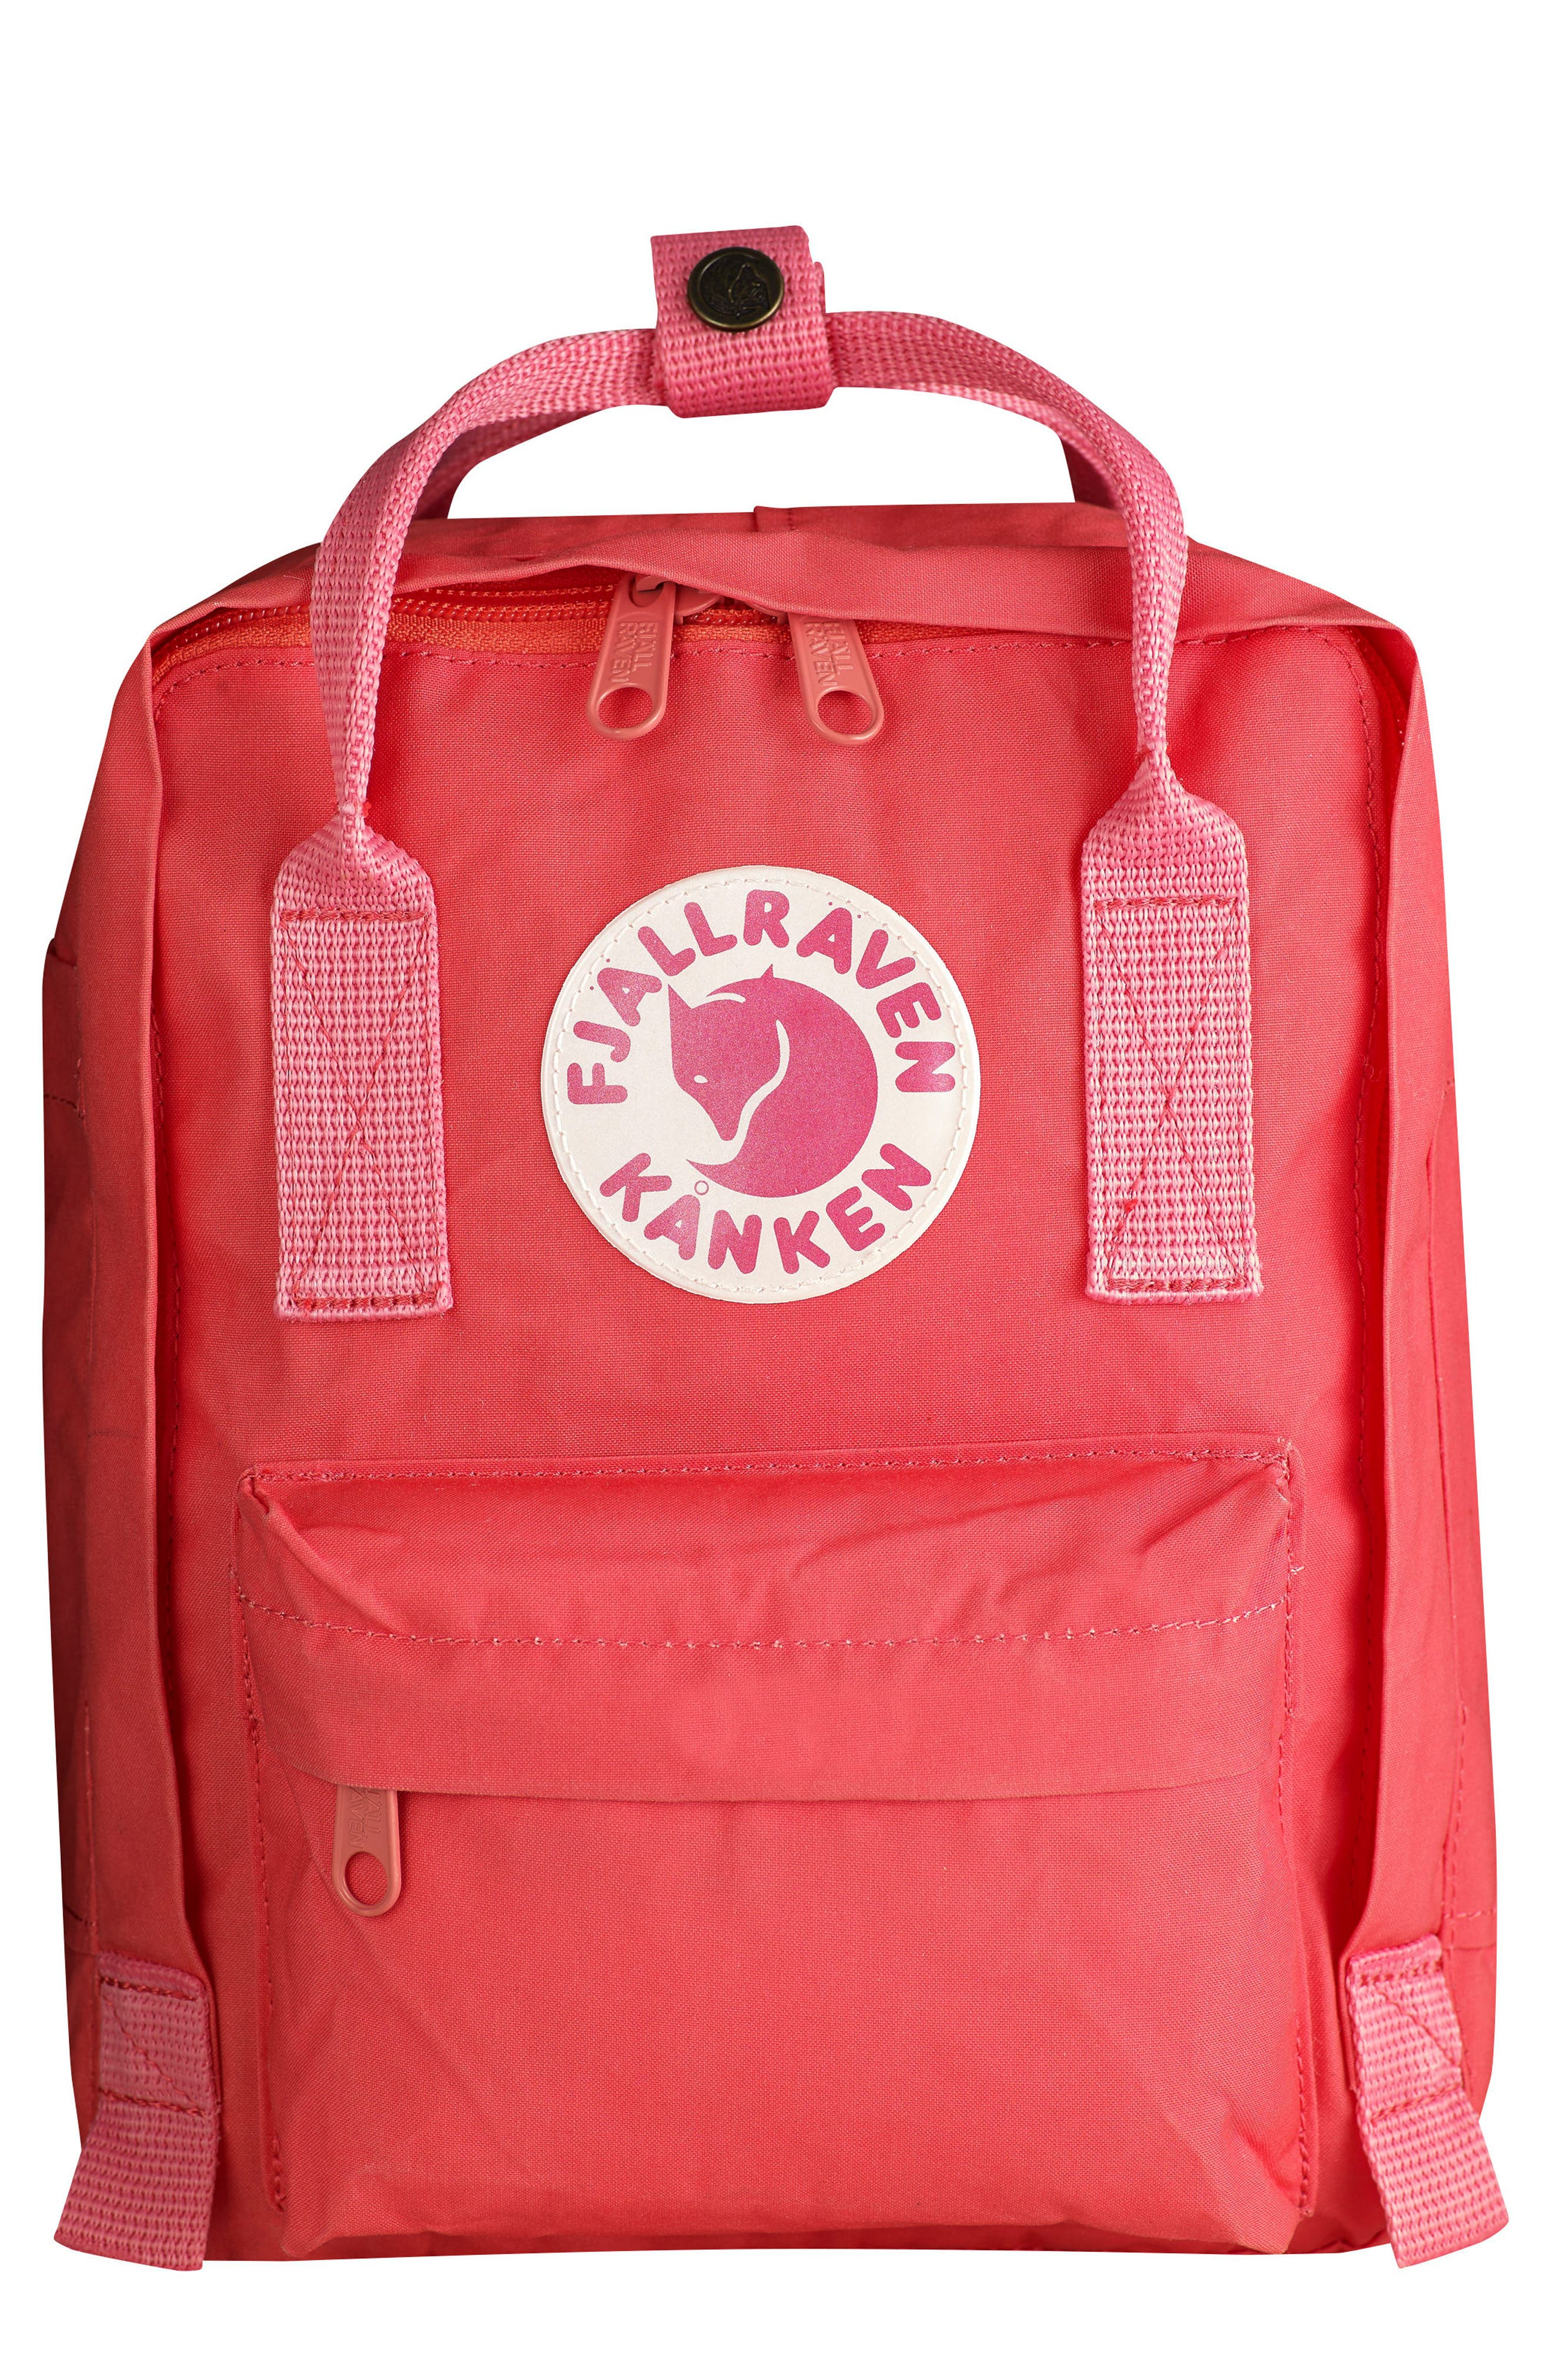 Converse Rucksack Womens Pink Saleup To 38 Discounts Backpack